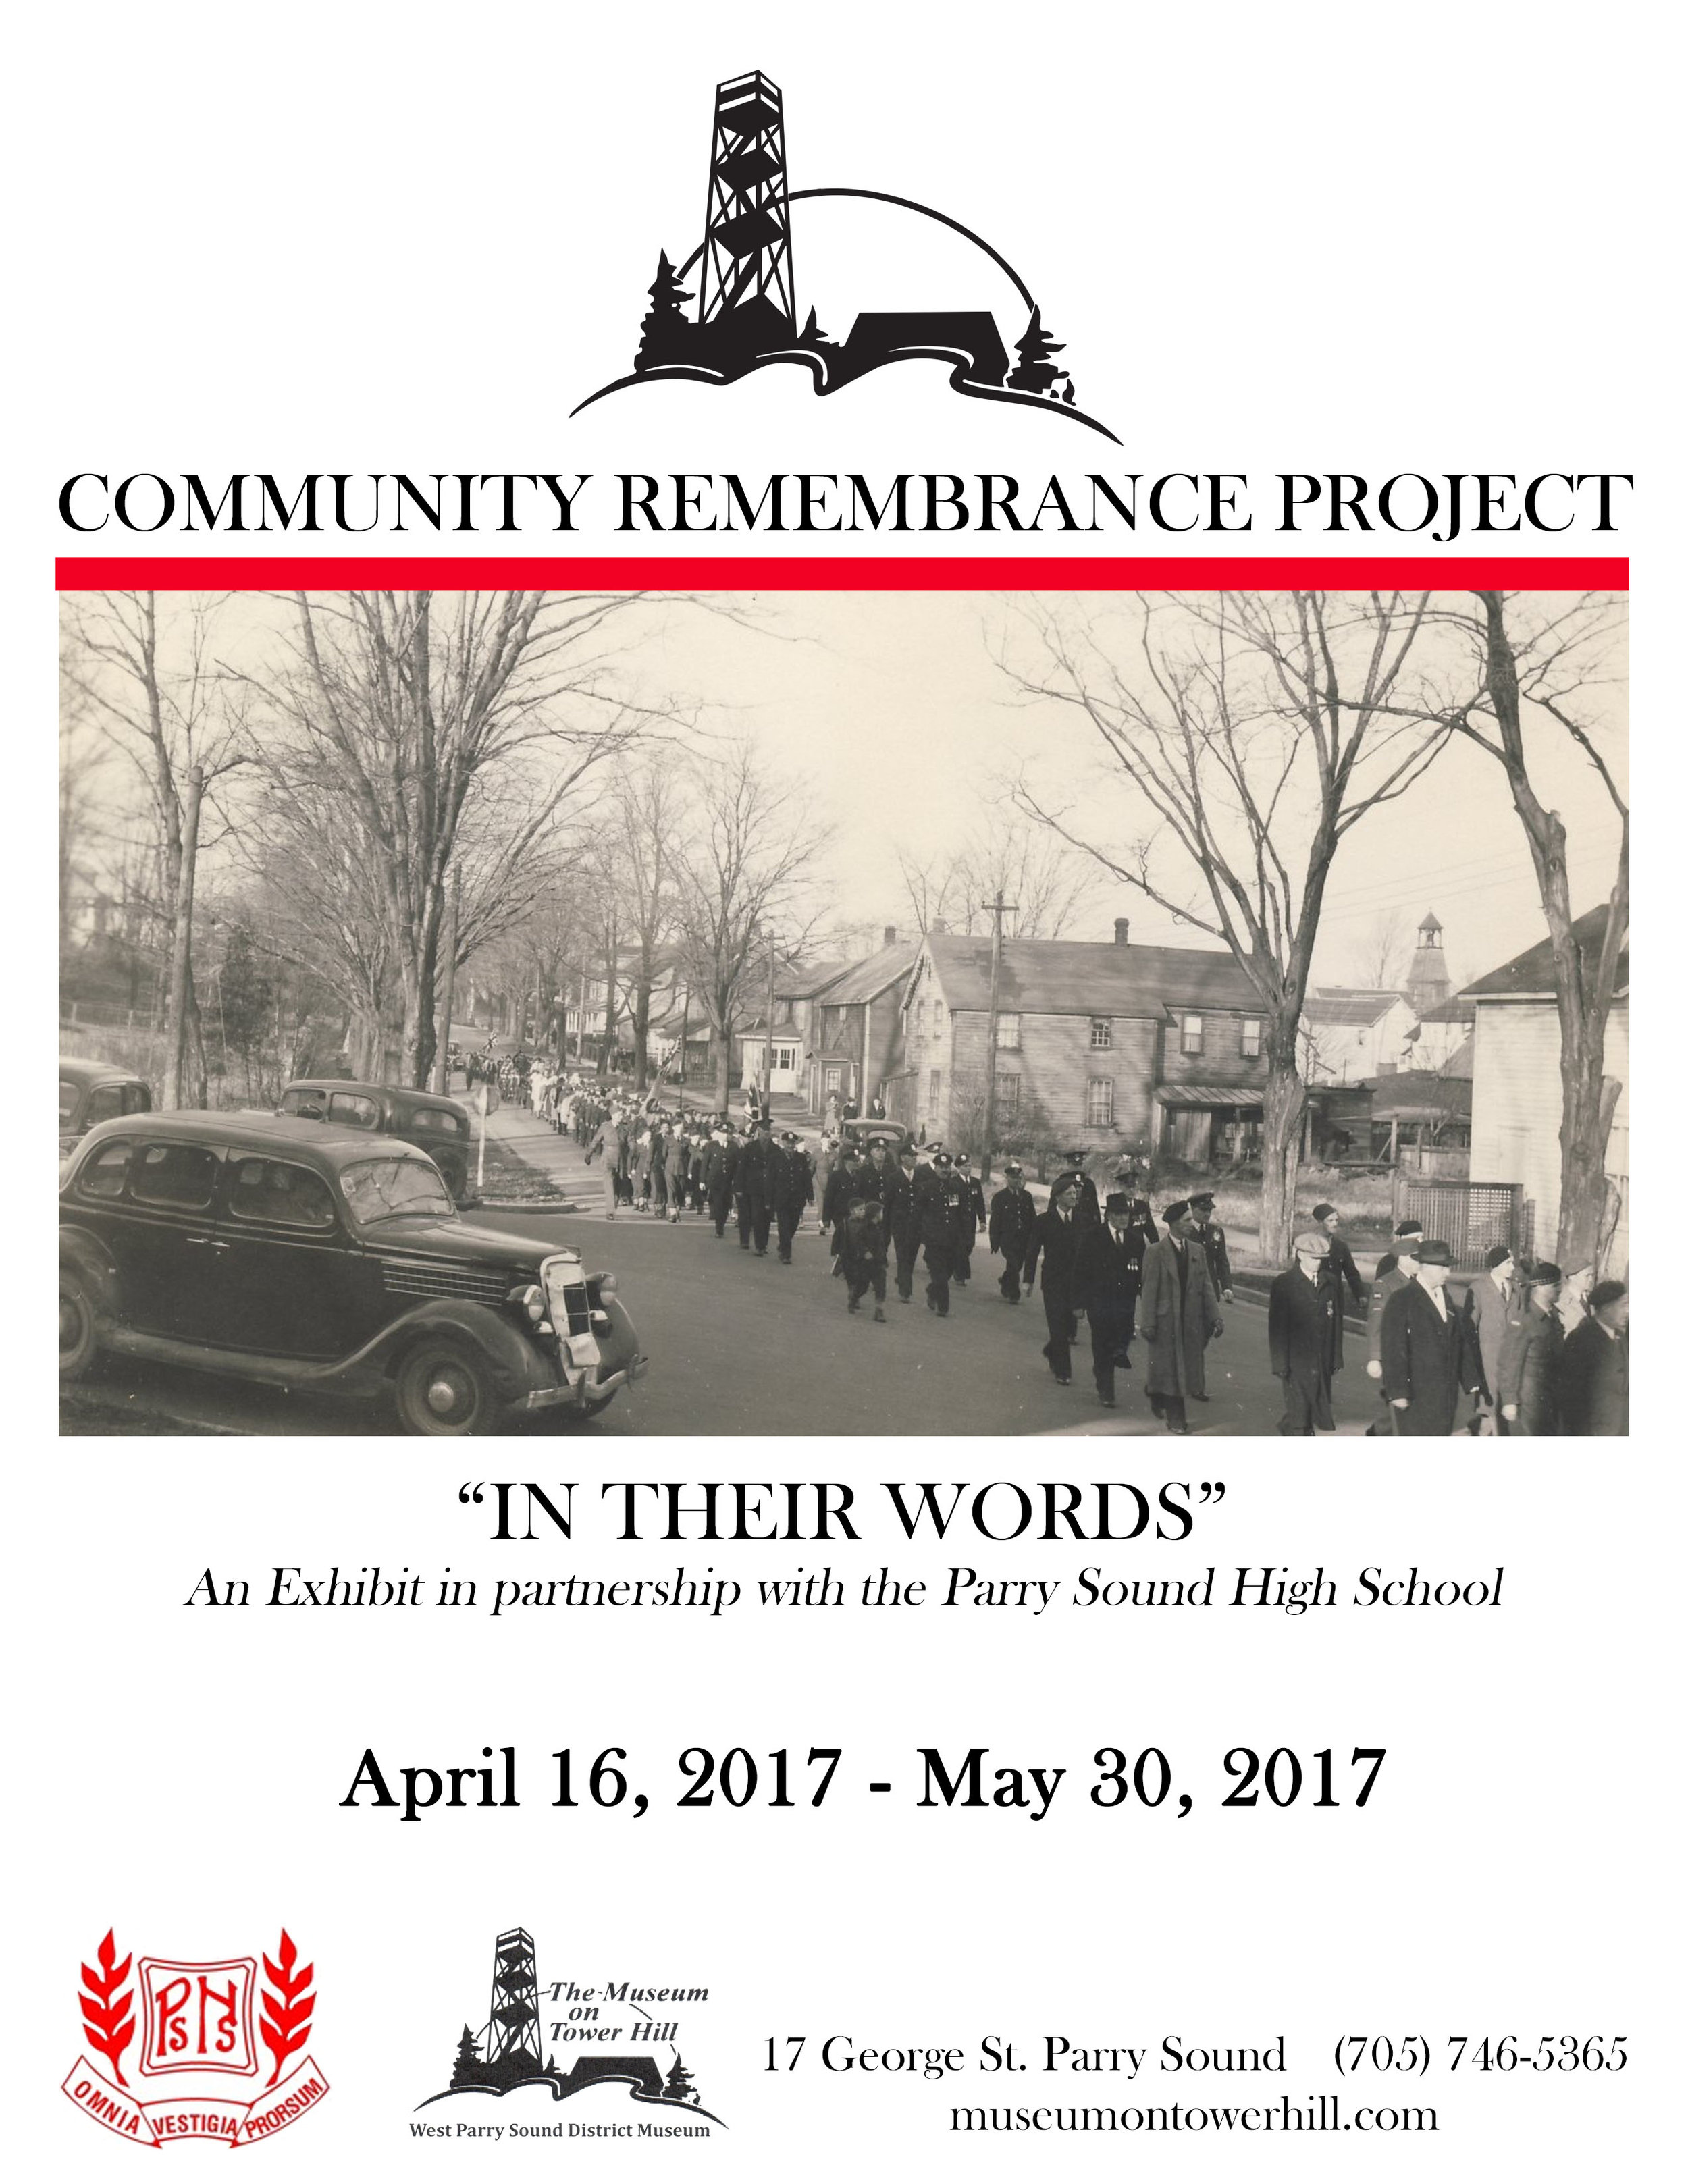 Com Rem Project 2017 Exhibit Poster.jpg